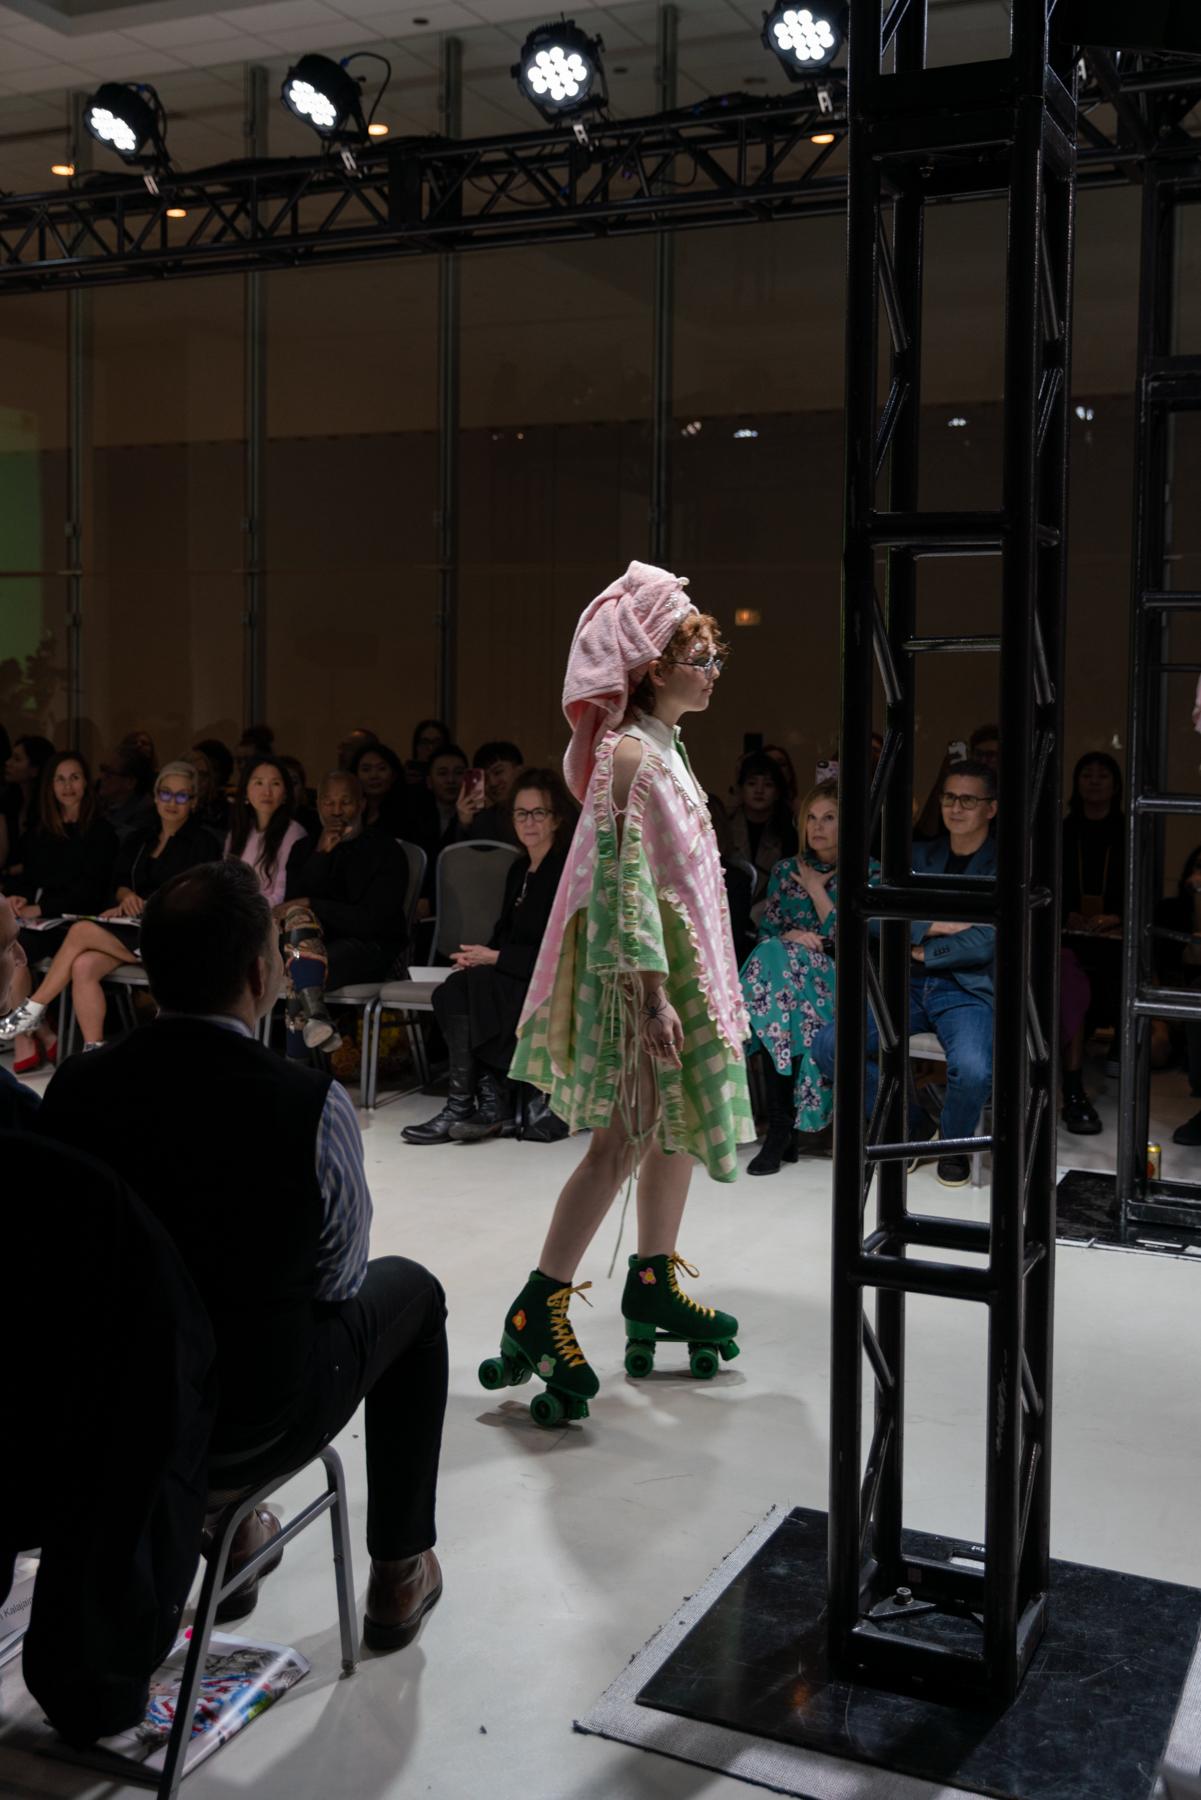 connor_fenwick_saic_fashion_event_06.jpg